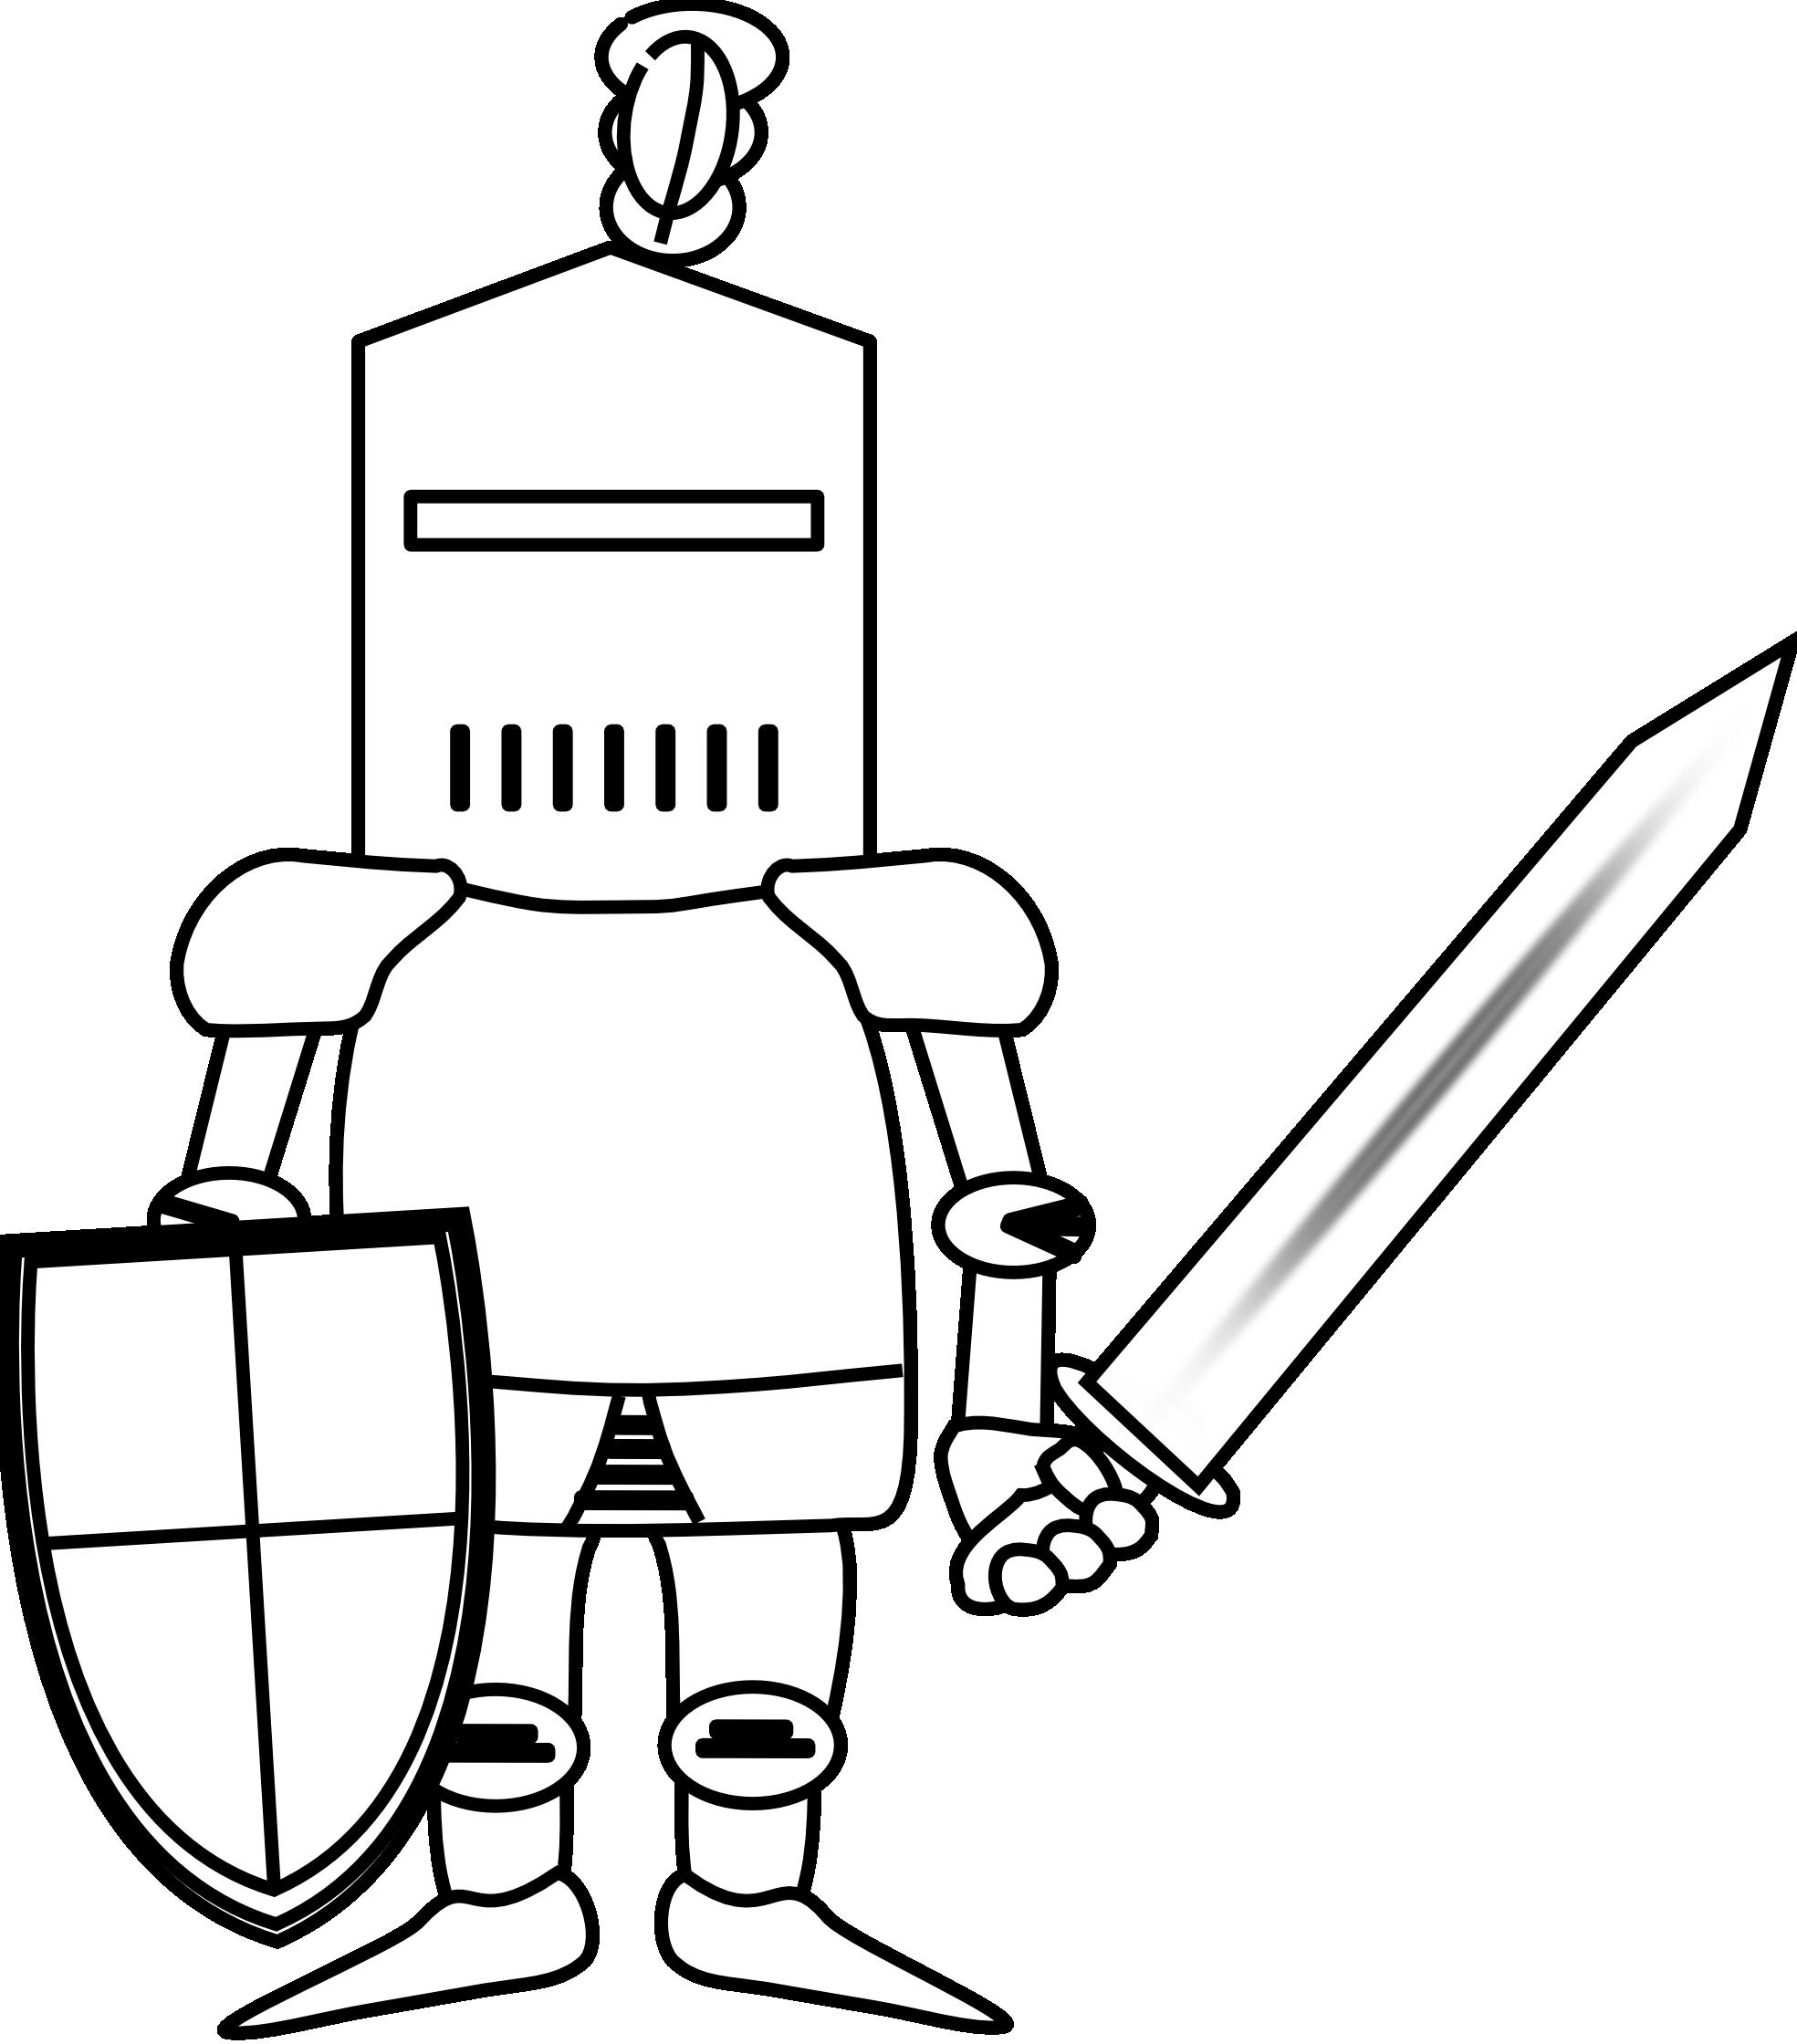 Clipart knight 2.